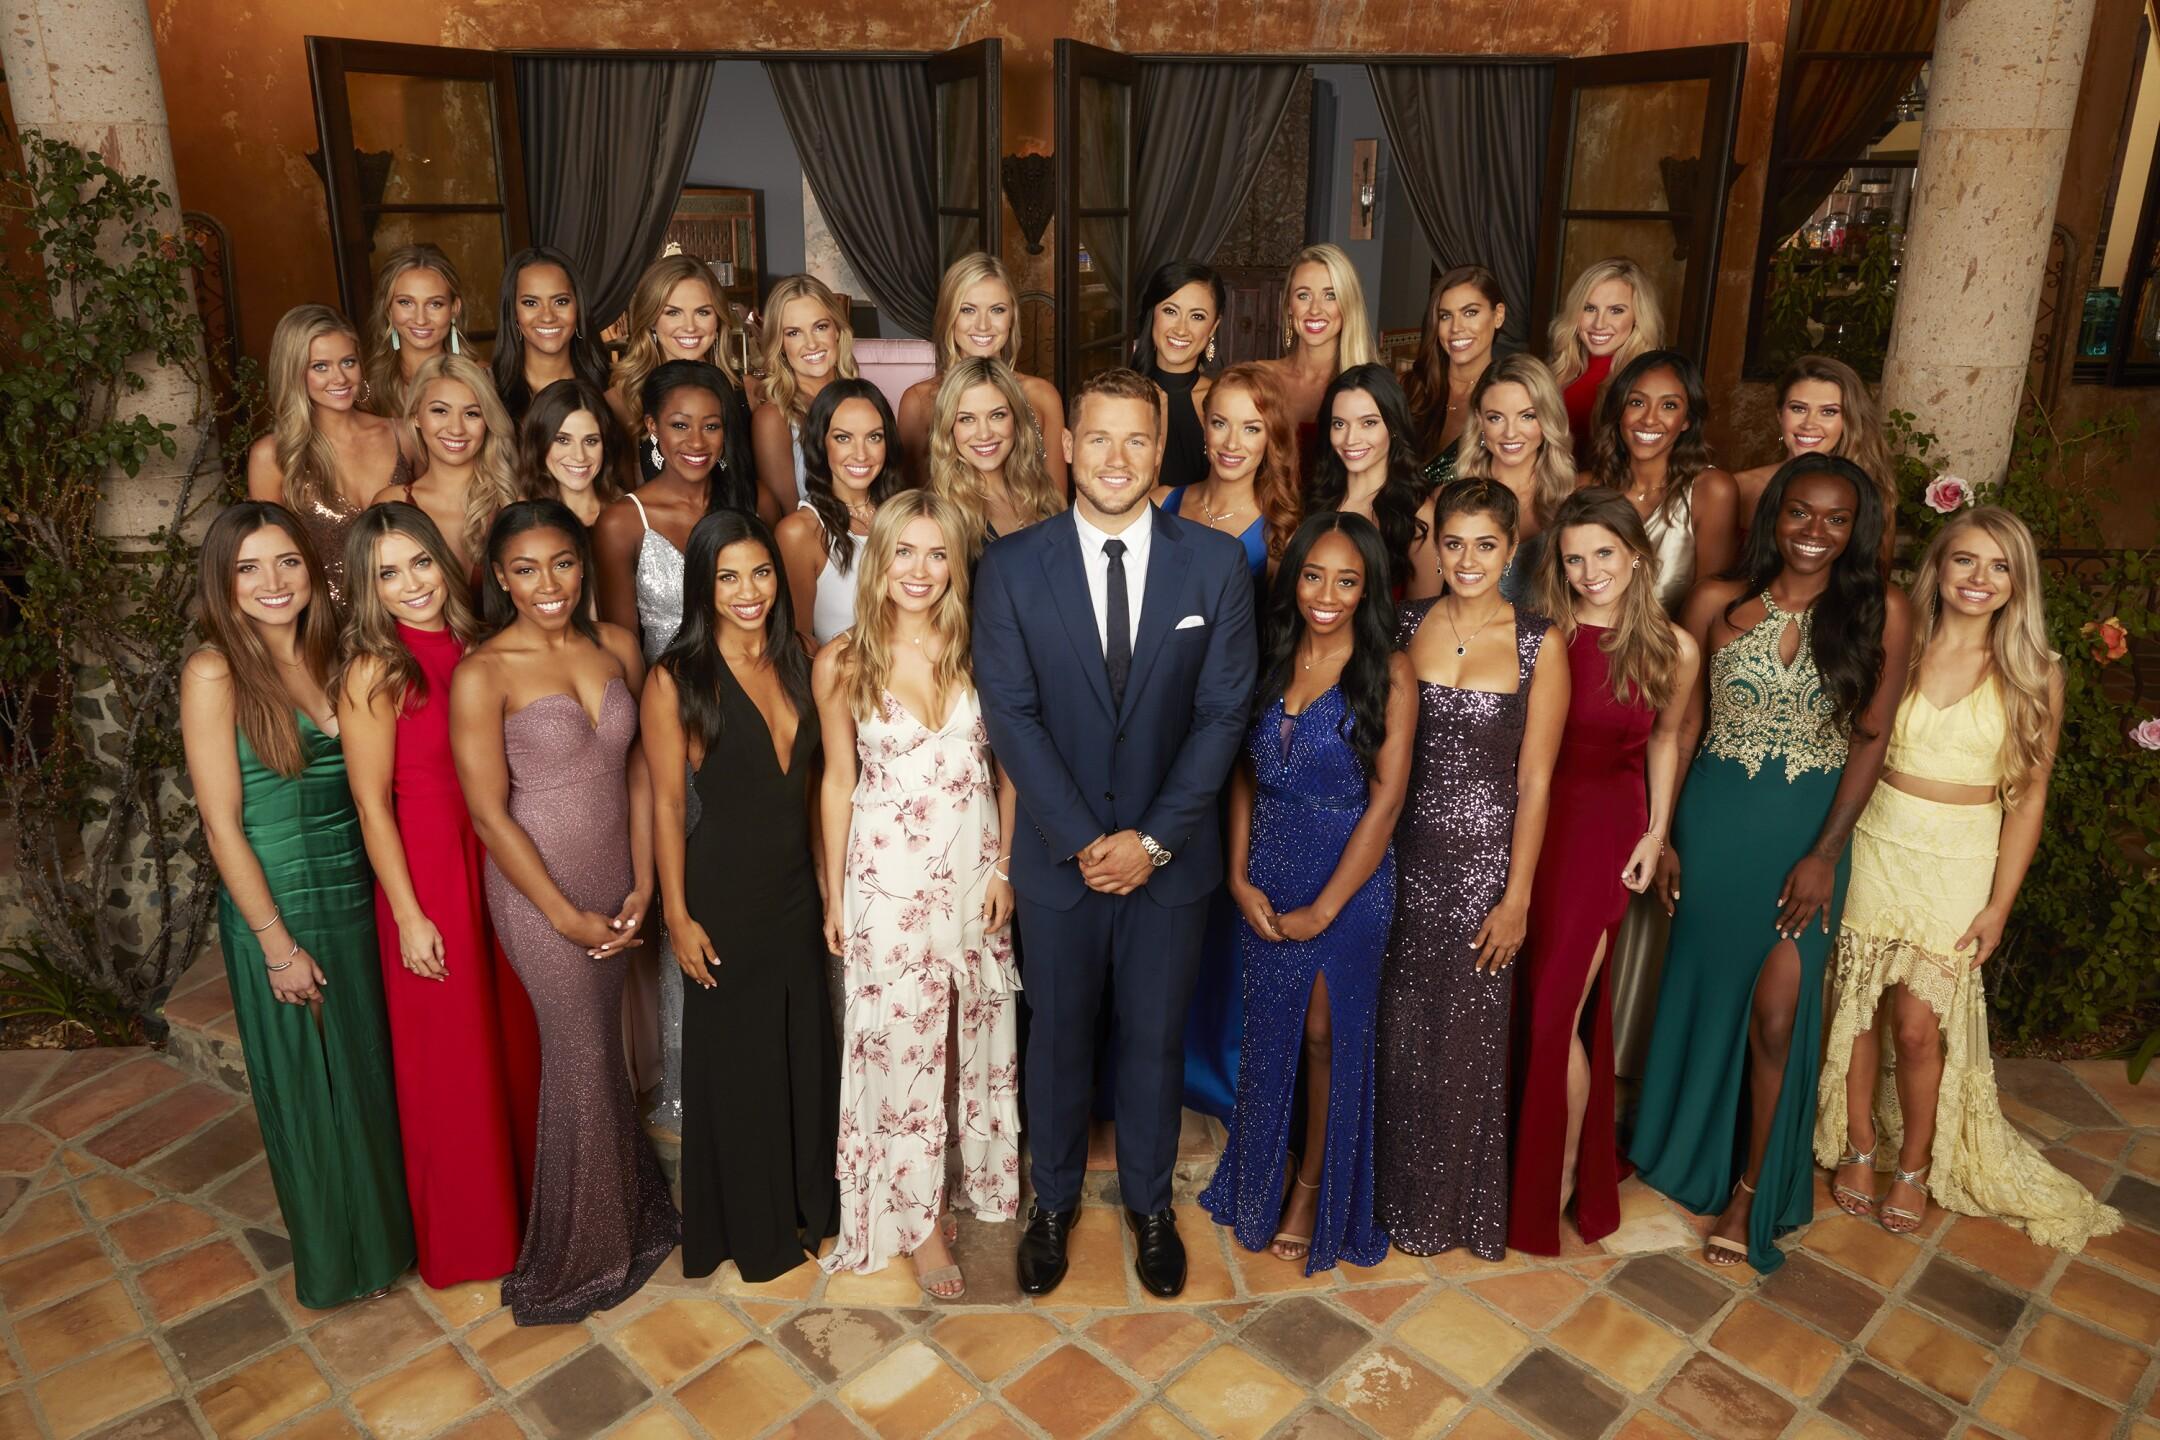 Season 23 Bachelor Colton Underwood group photo